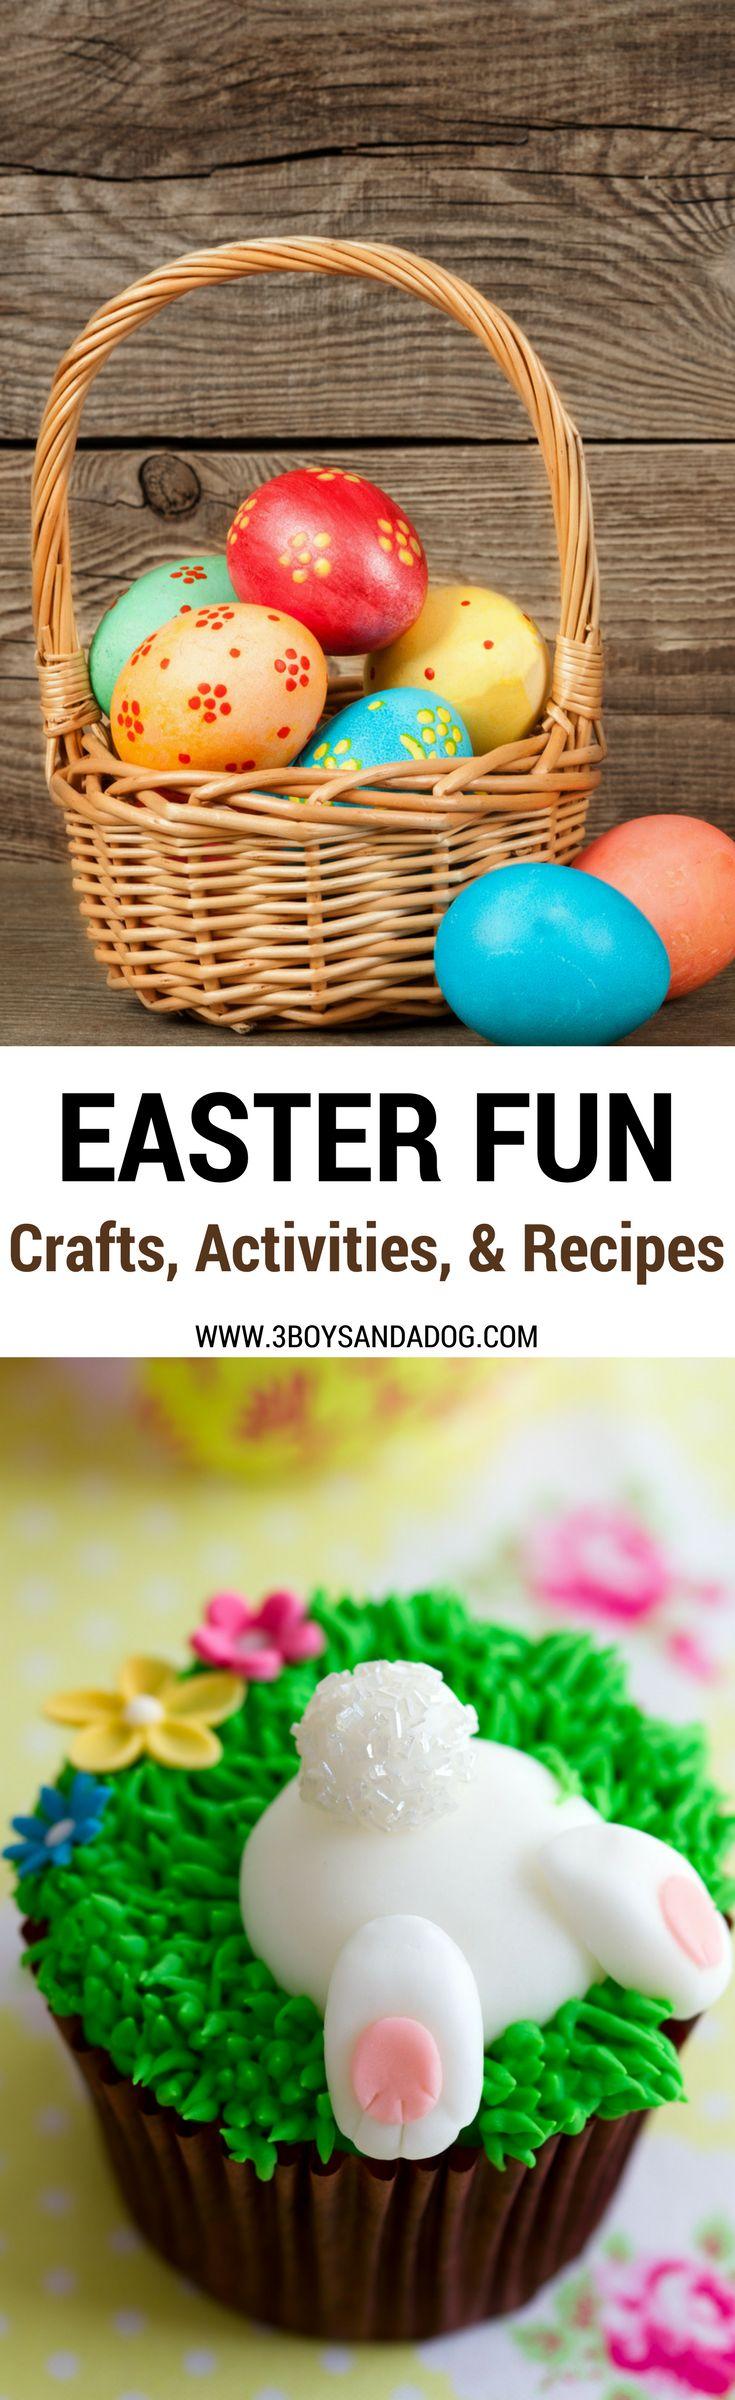 60 Easter Craft Ideas Plus Recipes